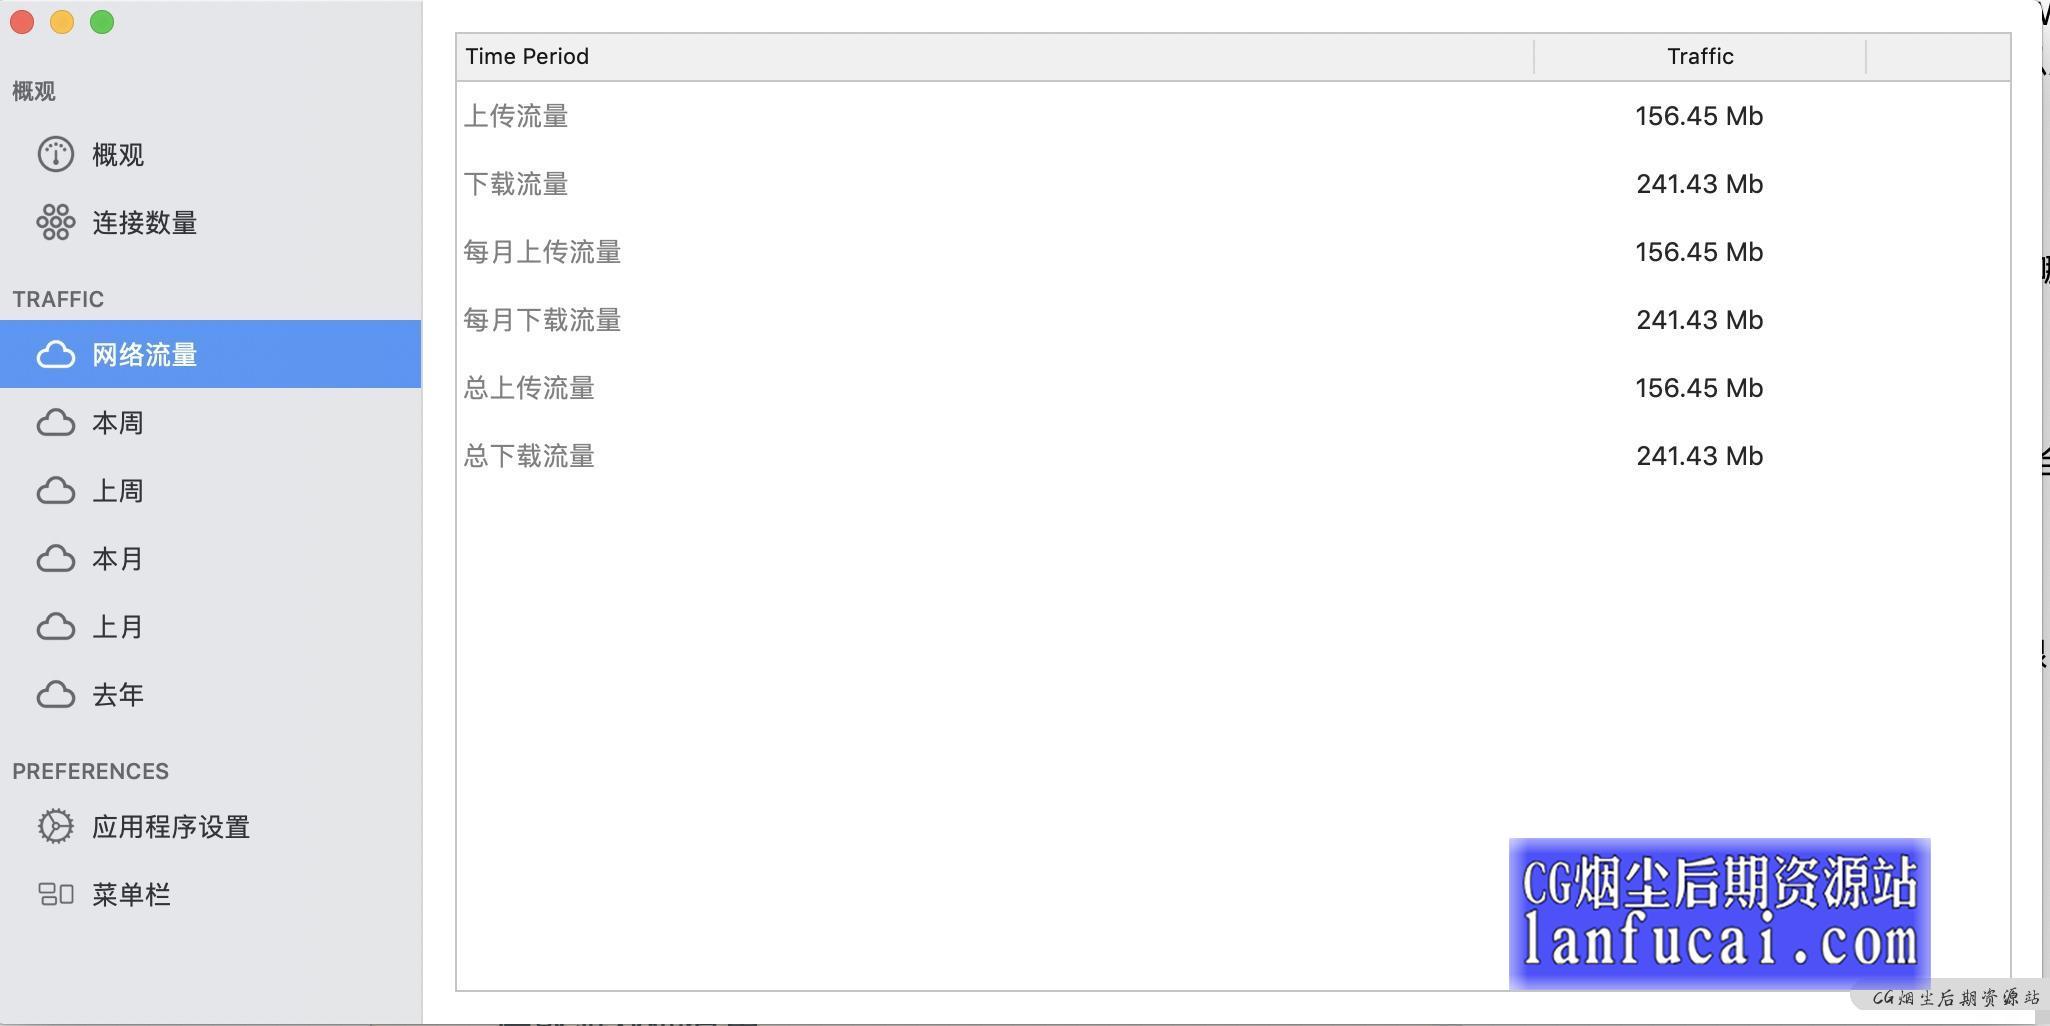 NetWorker Pro for mac(网络流量监控软件) v6.2.1-CG烟尘后期资源站